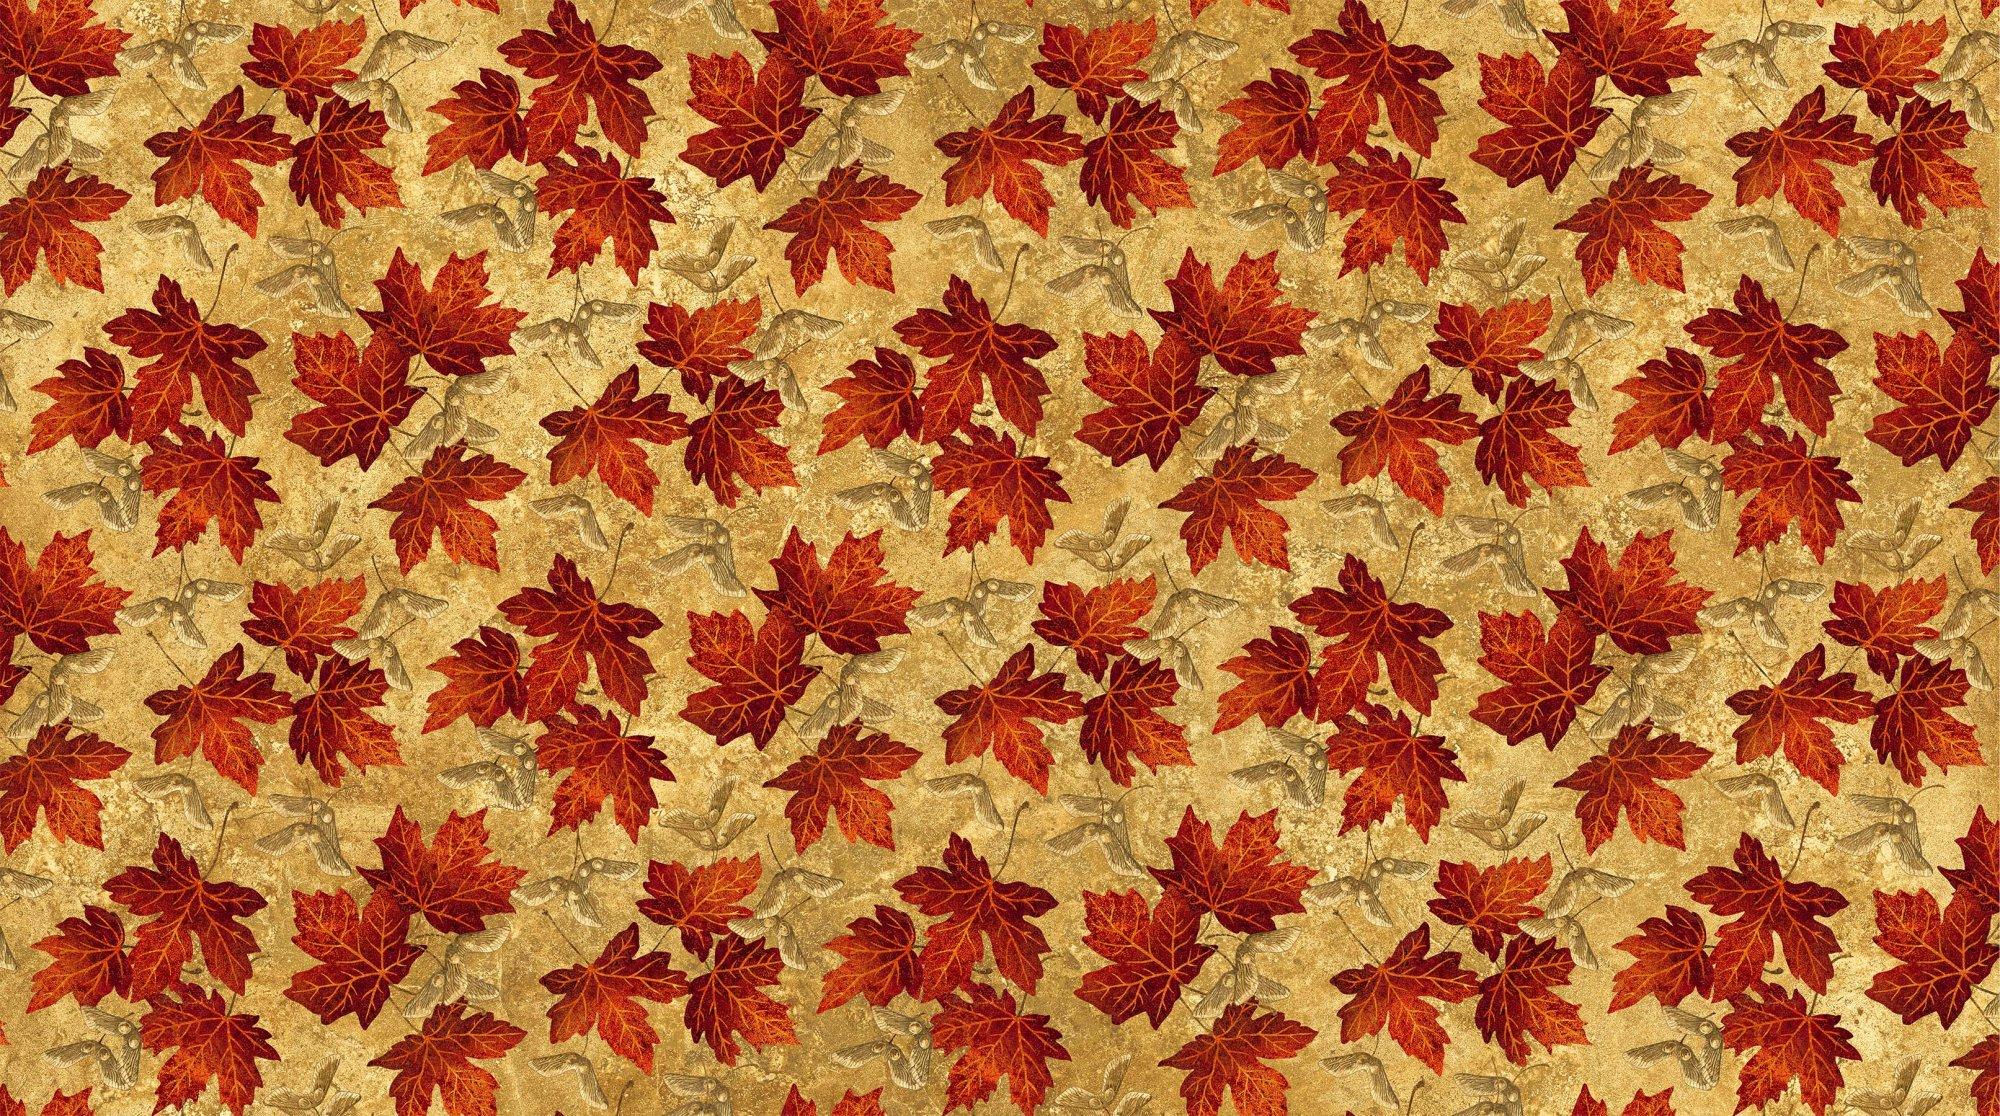 22017-34 Tan w_Lg Red Leaves Maplewood